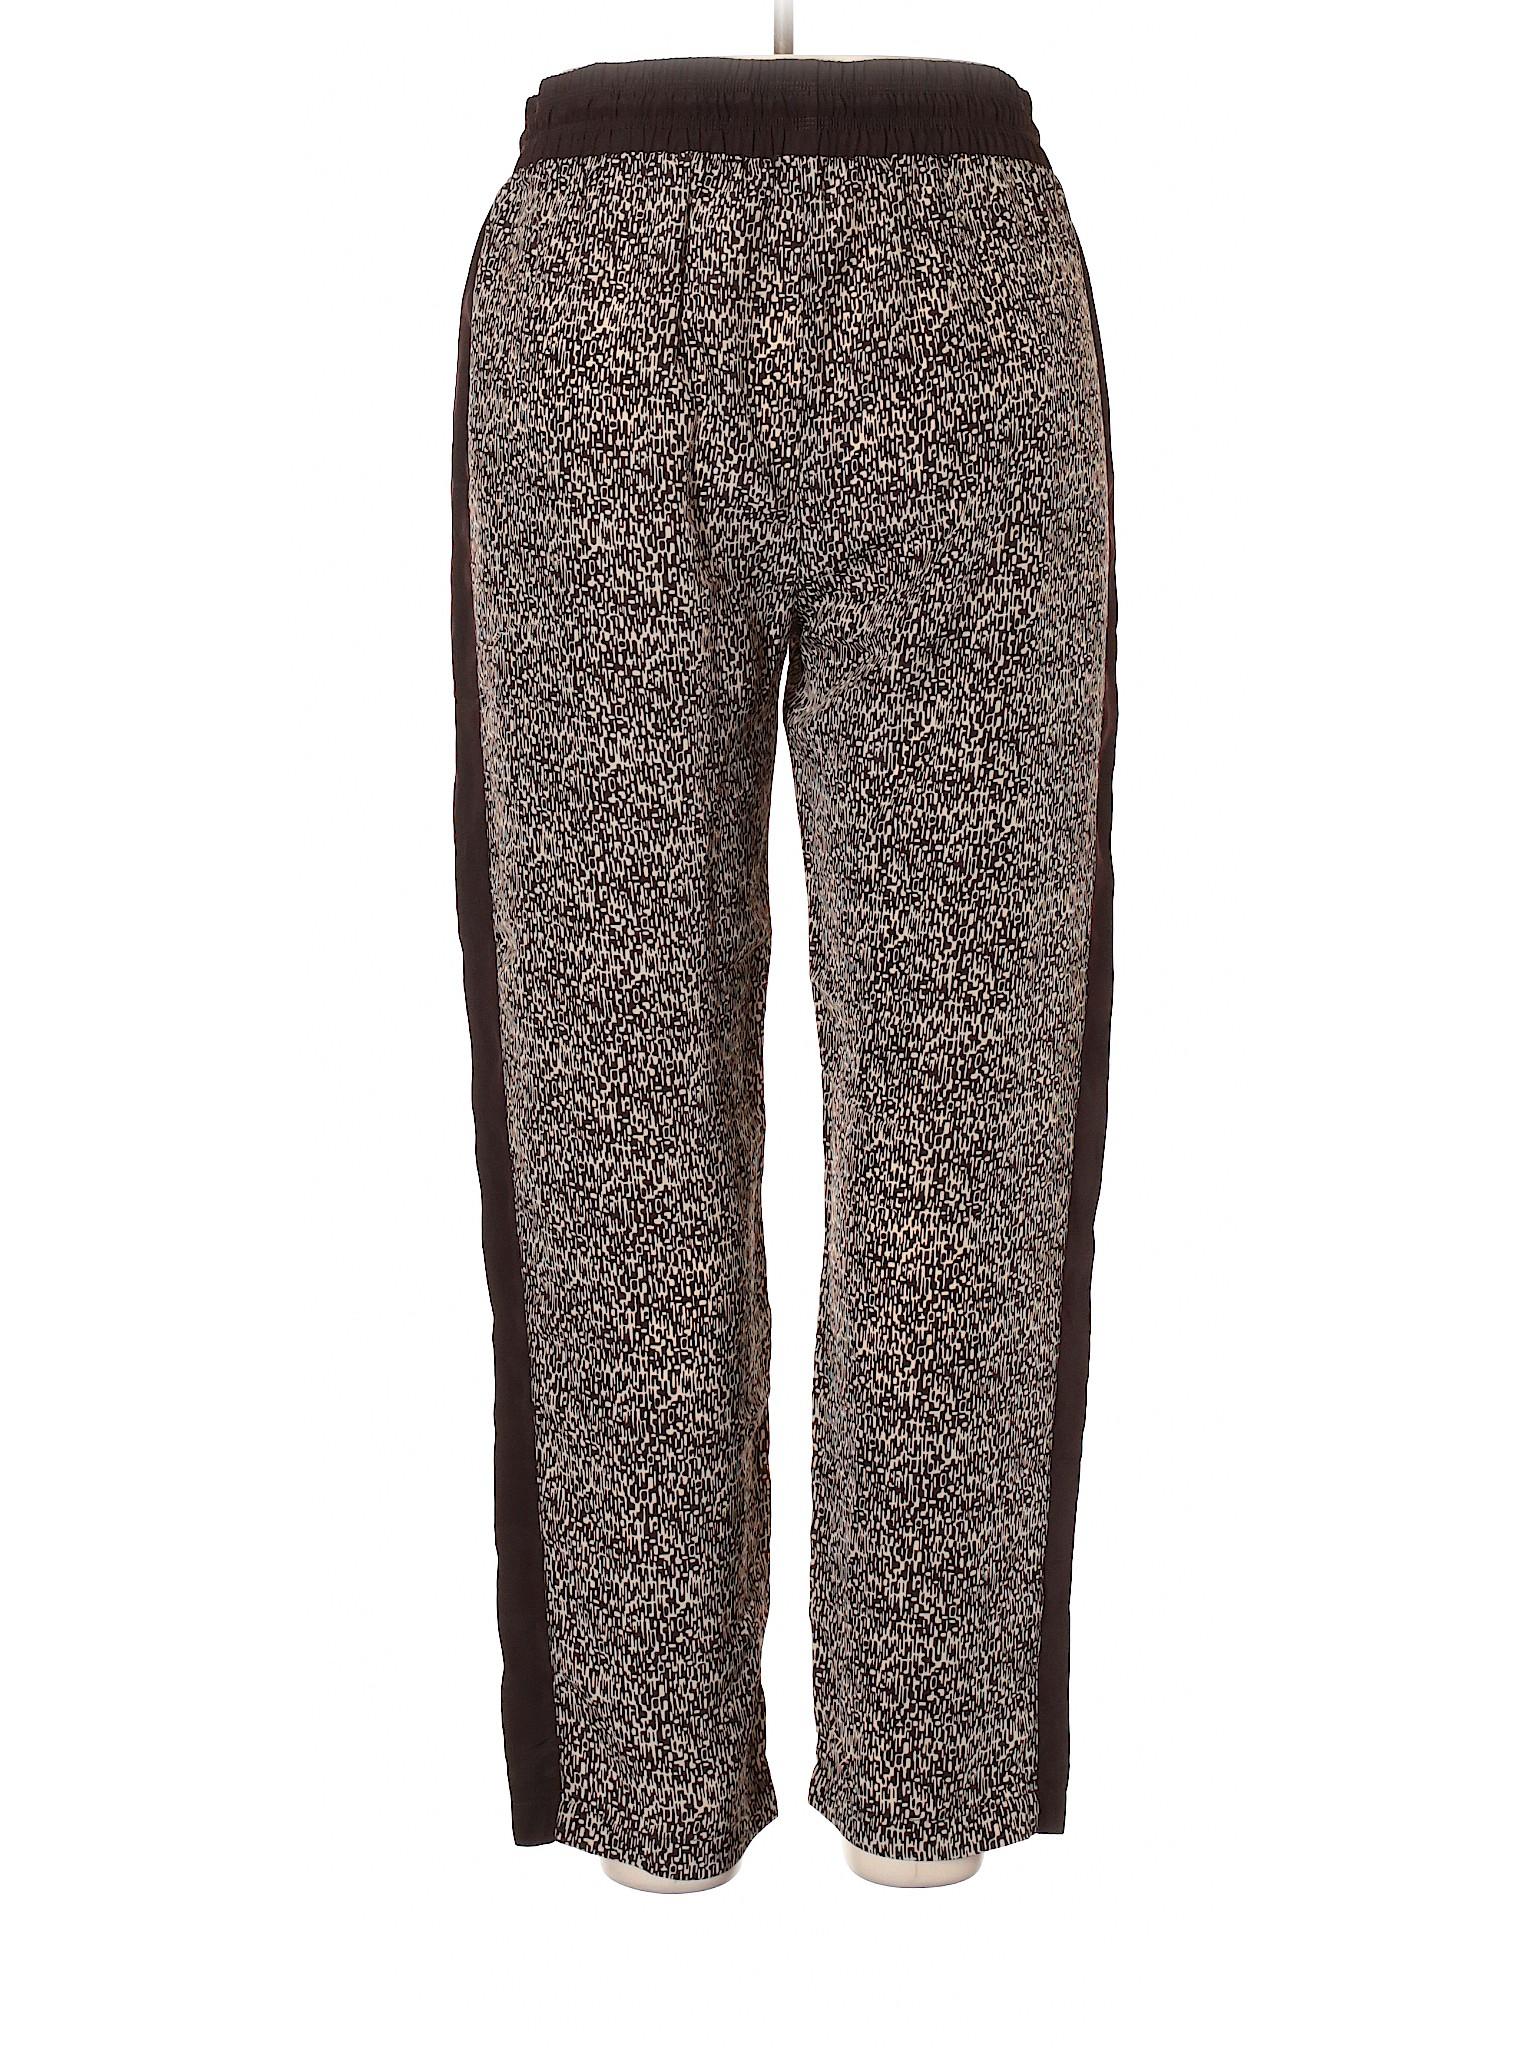 Casual Boutique winter Avon Casual Pants Boutique winter winter Avon Pants Boutique Avon R6HqUvFR